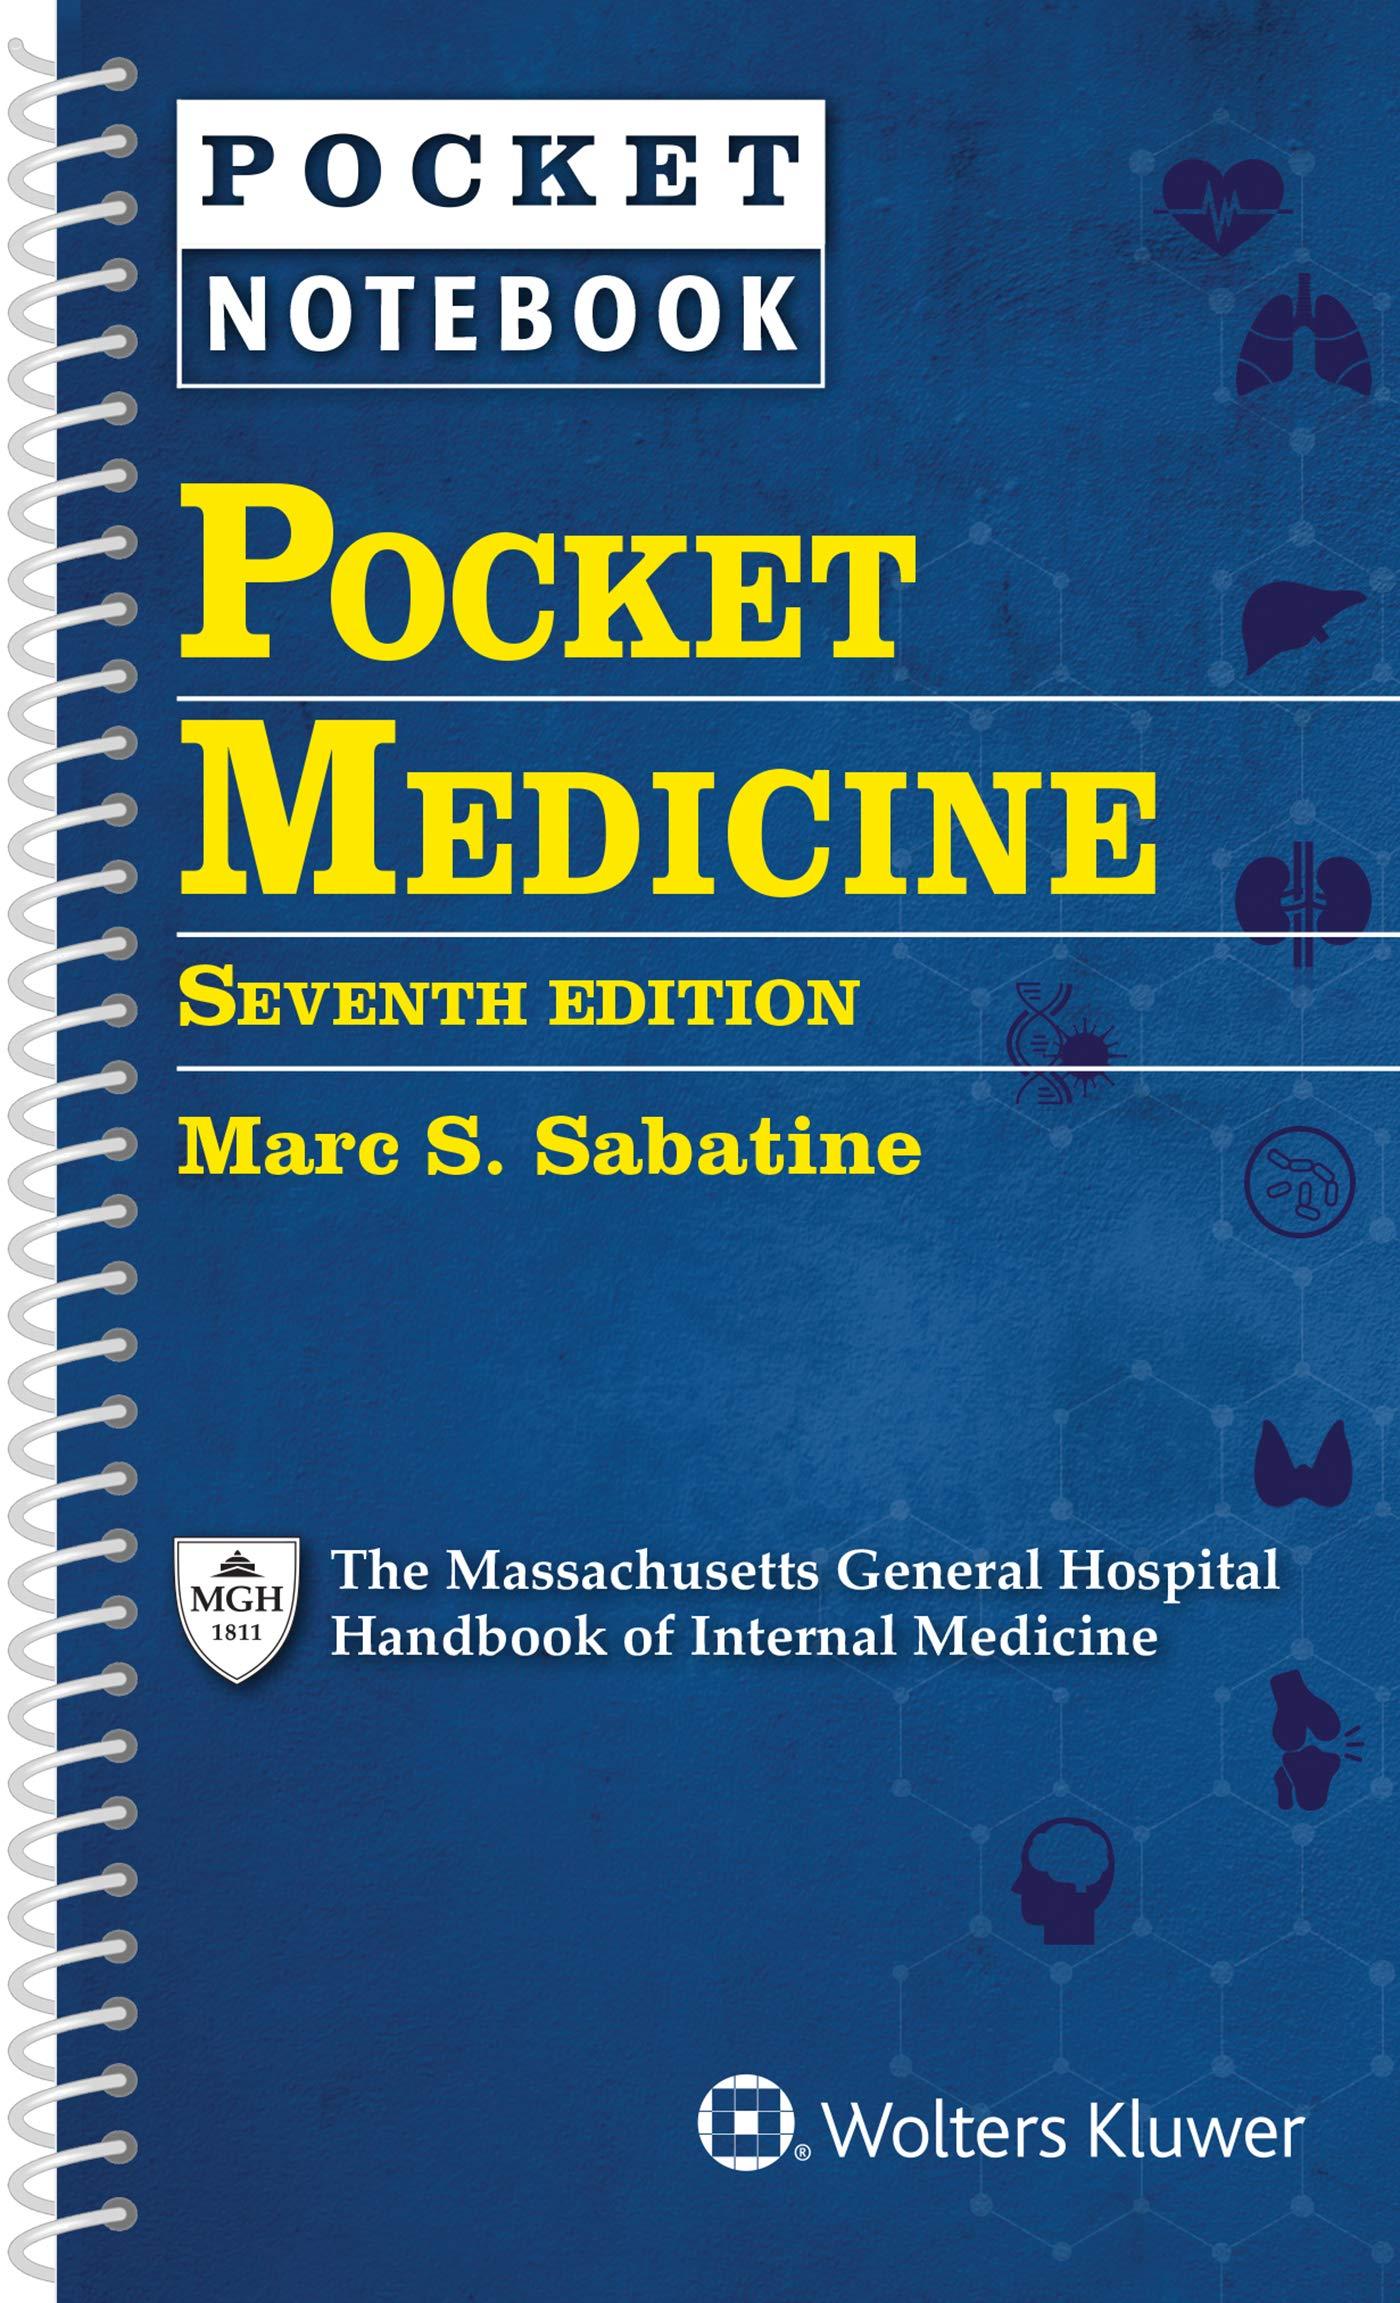 Pocket Medicine: The Massachusetts General Hospital Handbook of Internal Medicine by LWW